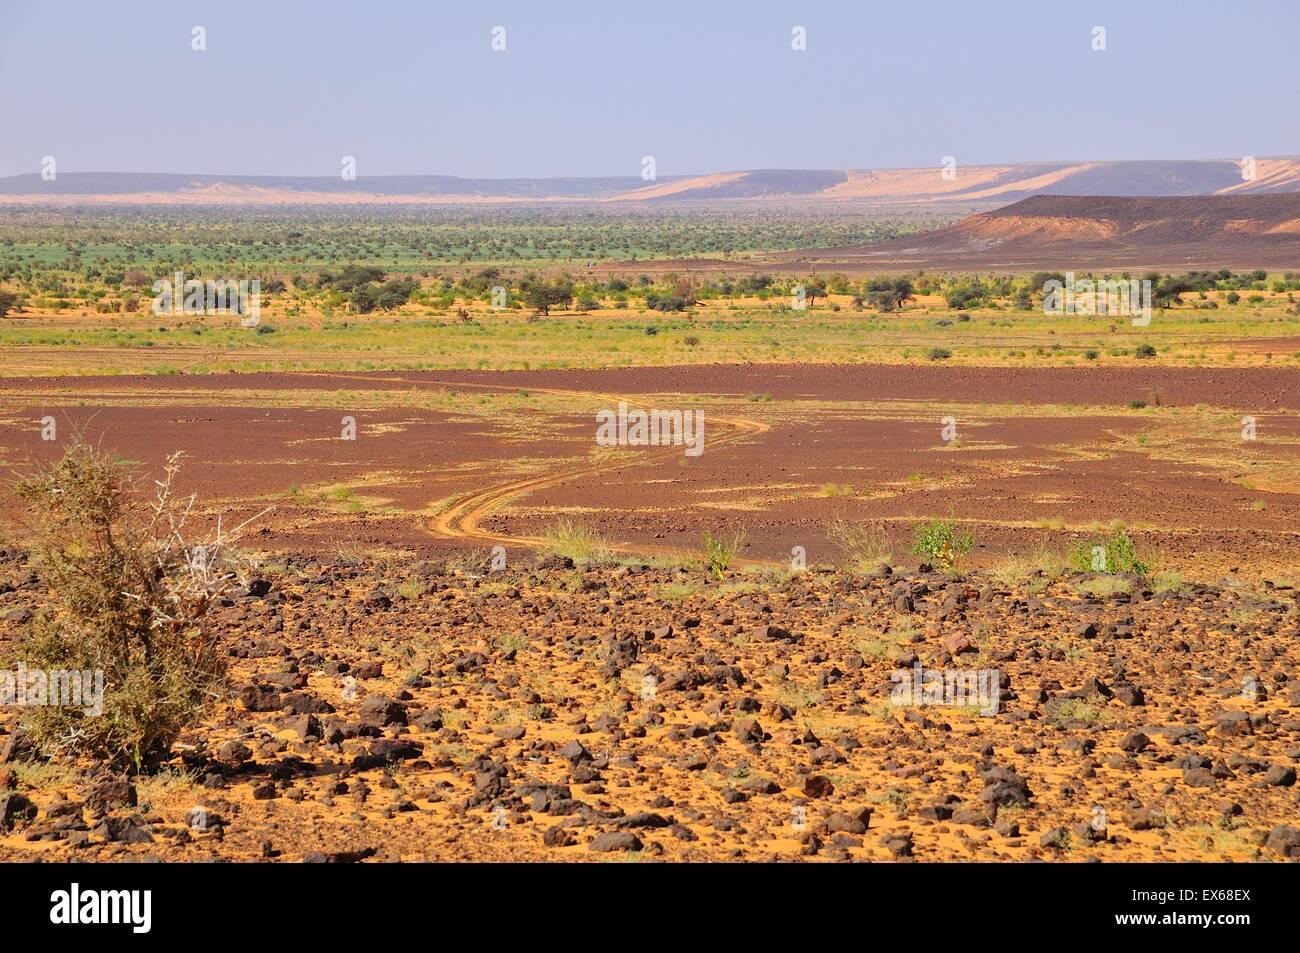 Desert landscape with tire tracks, route from Atar to Tidjikja, Adrar region, Mauritania - Stock Image